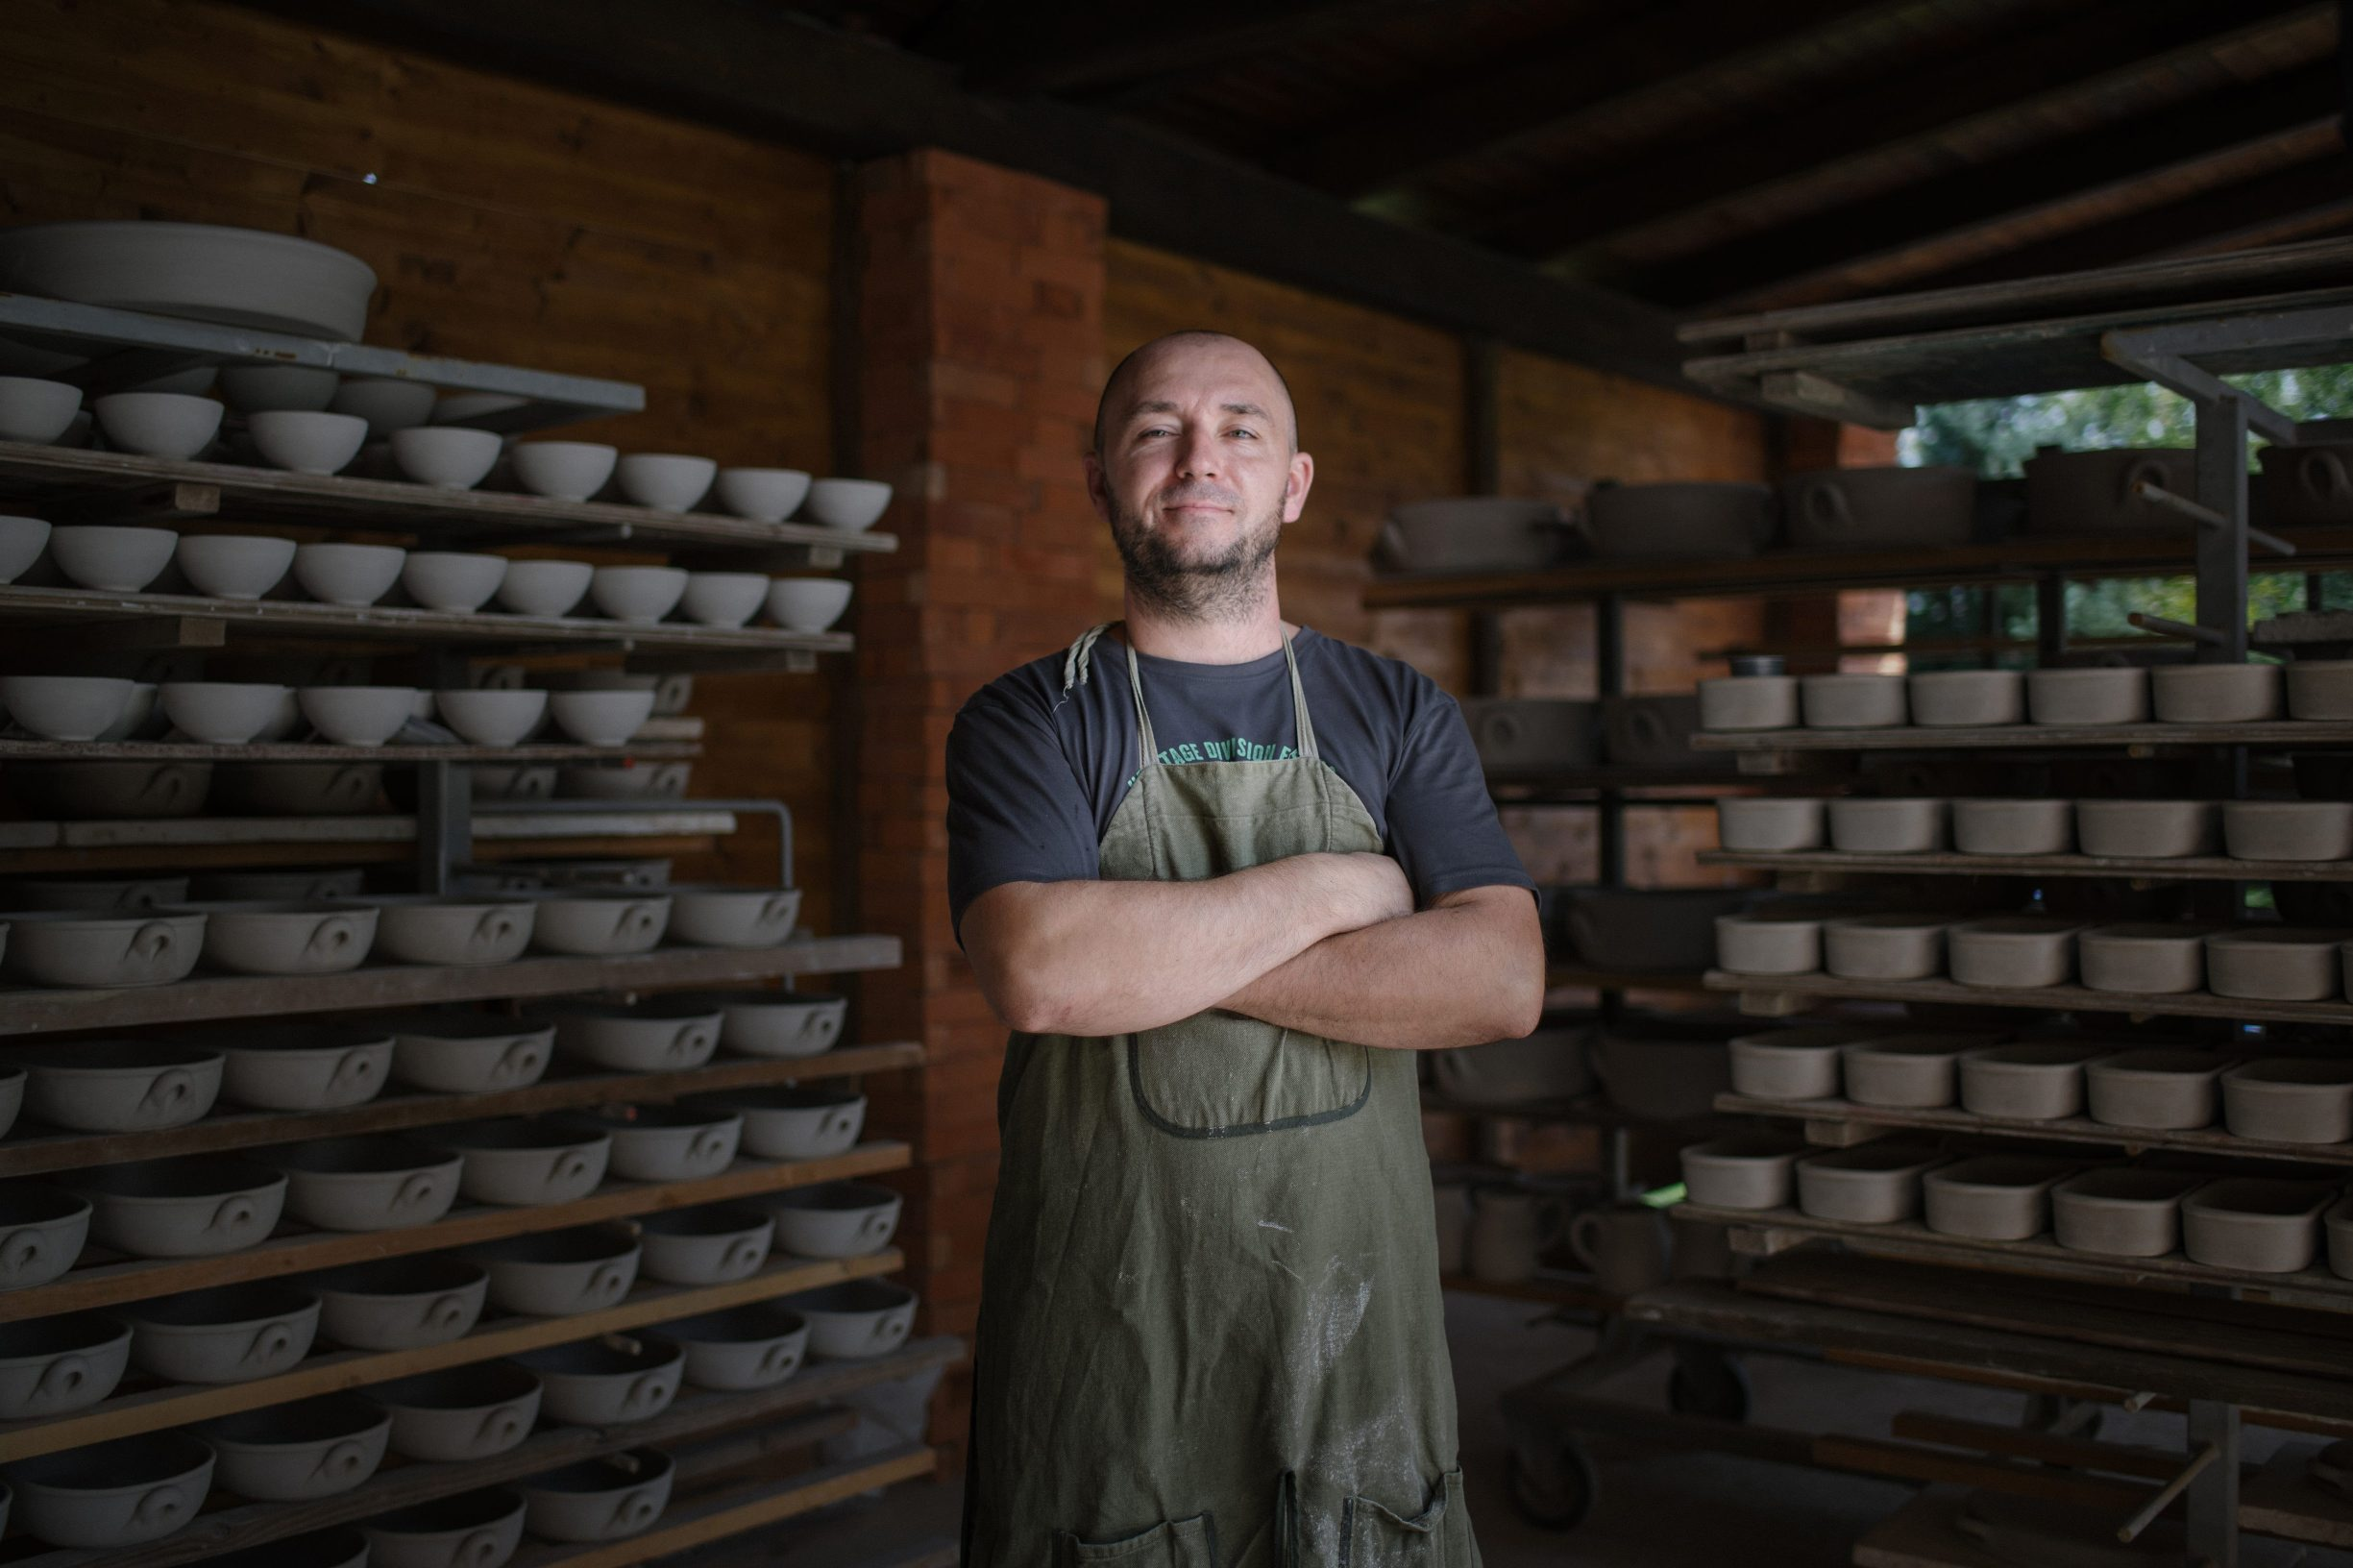 Ivanec, 210819. Obrt Keramika Mecena, gdje se tradicionalnim metodama proizvodi posude od keramike. Na slici je Ivan Kuca. Foto: Marko Miscevic / Cropix